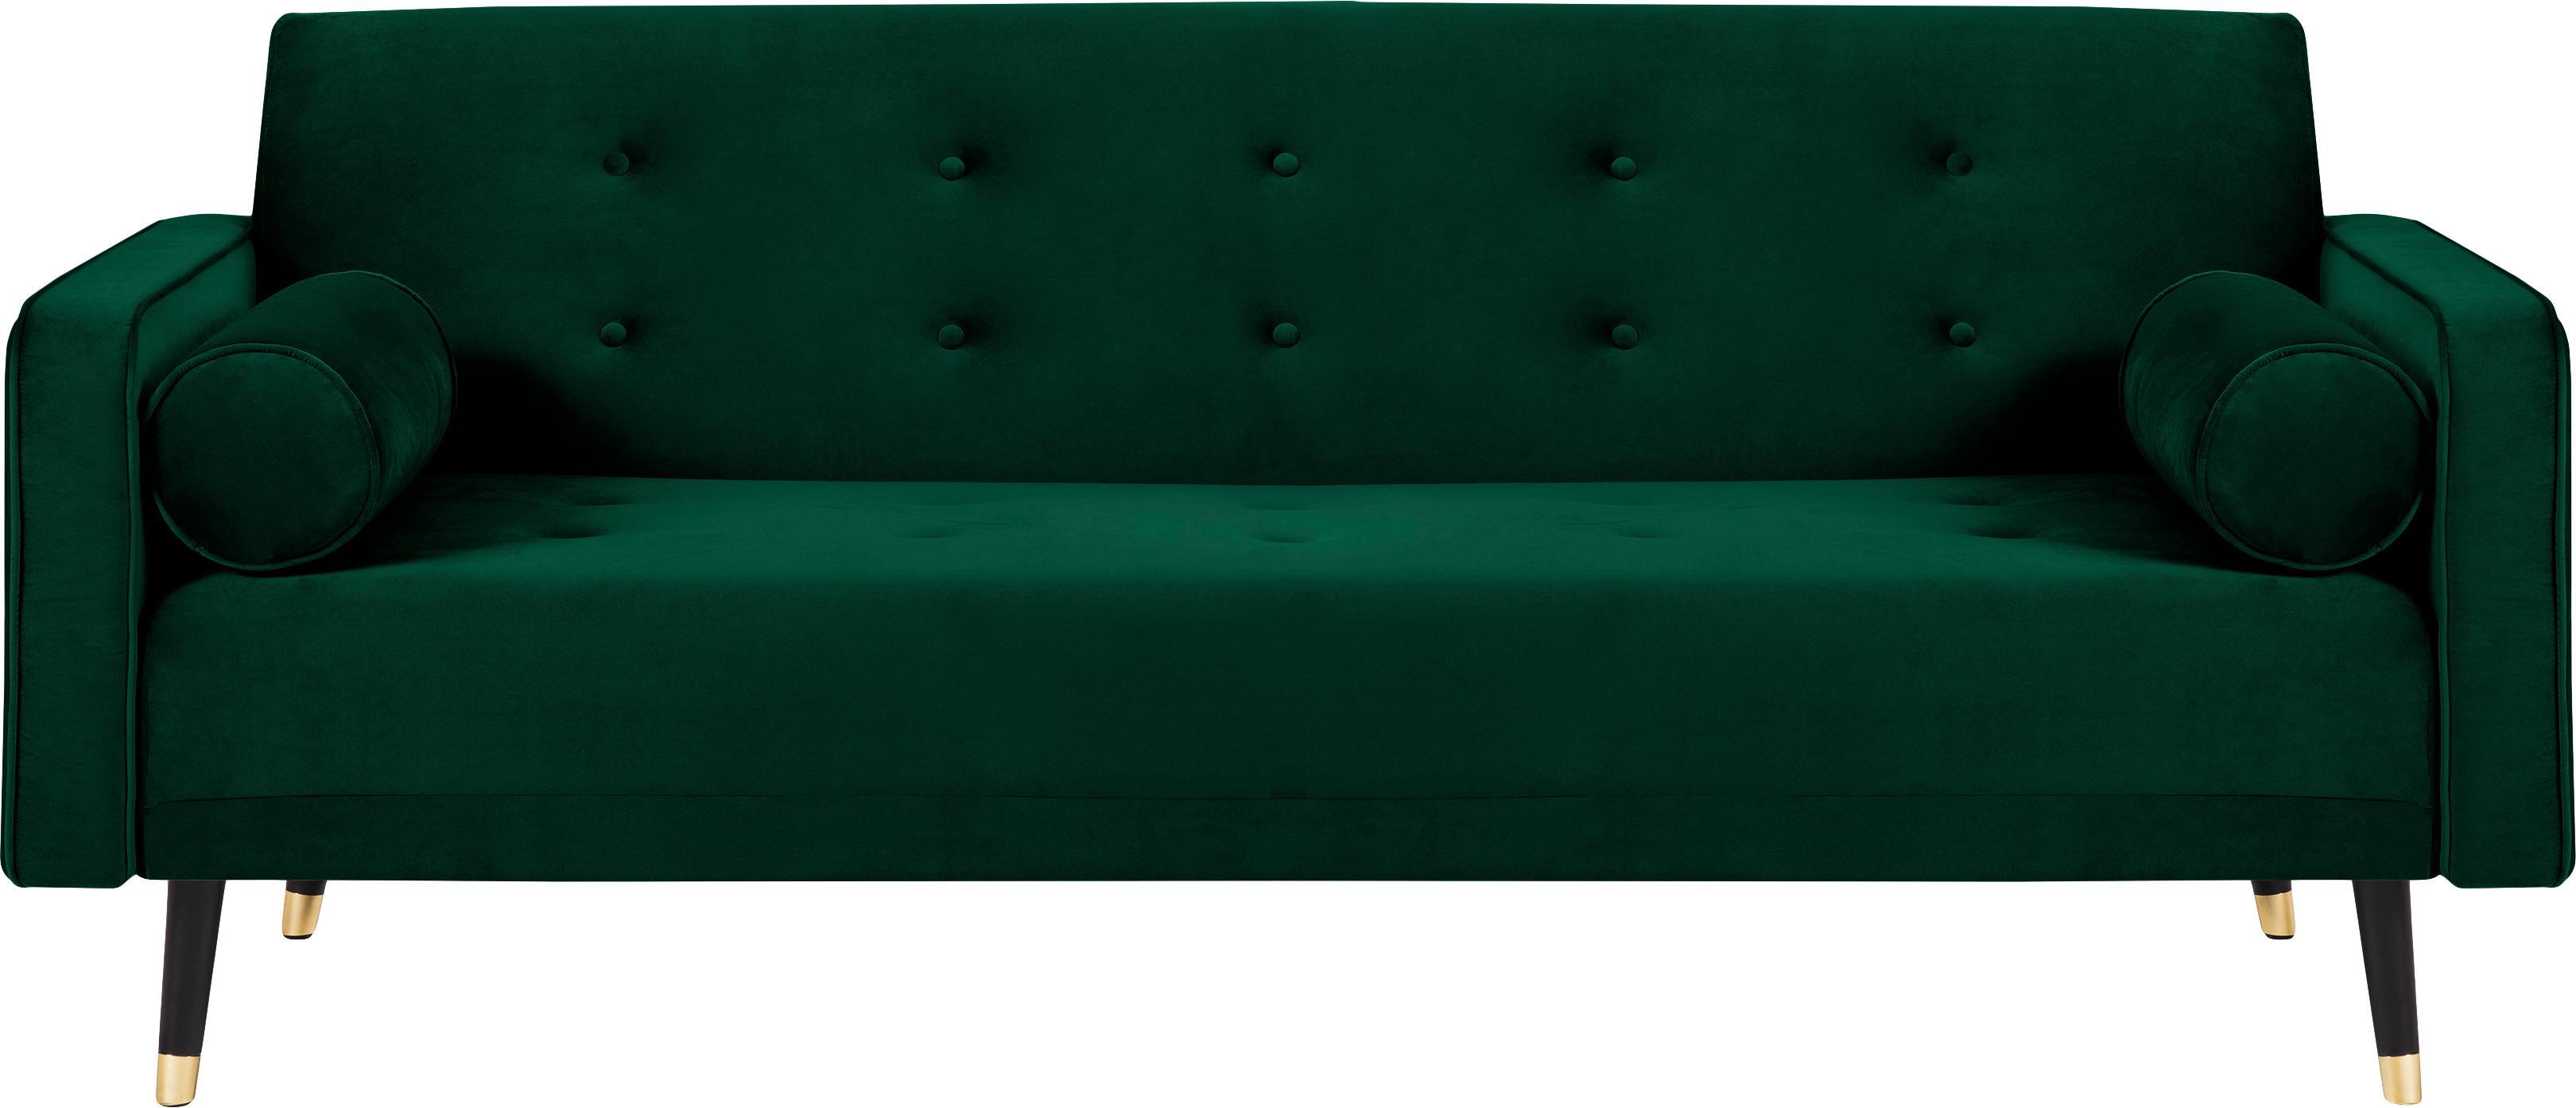 Samt-Schlafsofa Gia (3-Sitzer), Bezug: Polyestersamt Der strapaz, Rahmen: Massives Kiefernholz, Korpus: Spanplatte, Sperrholz, Sp, Füße: Buchenholz, lackiert, Samt Dunkelgrün, B 212 x T 93 cm